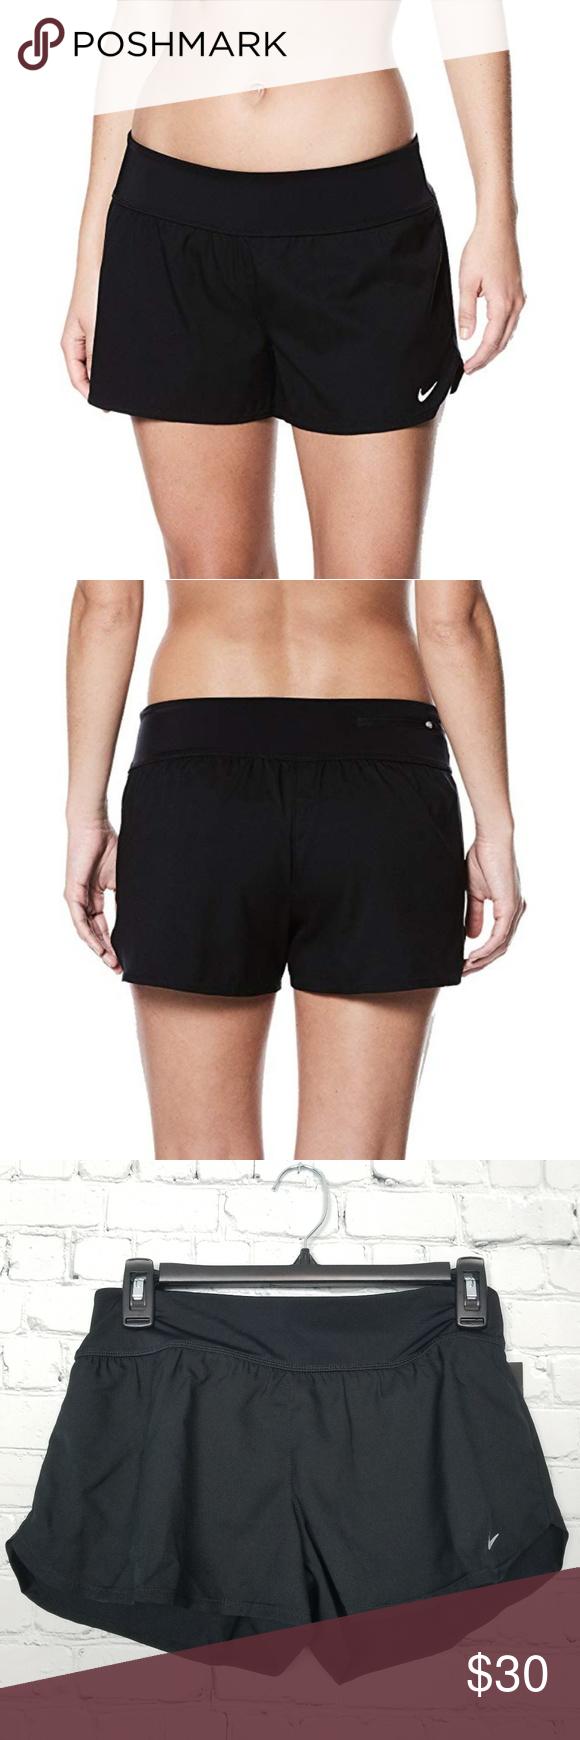 b0db0c6c1314 NWT Nike Womens Solid Element Swim Board Shorts New with tags